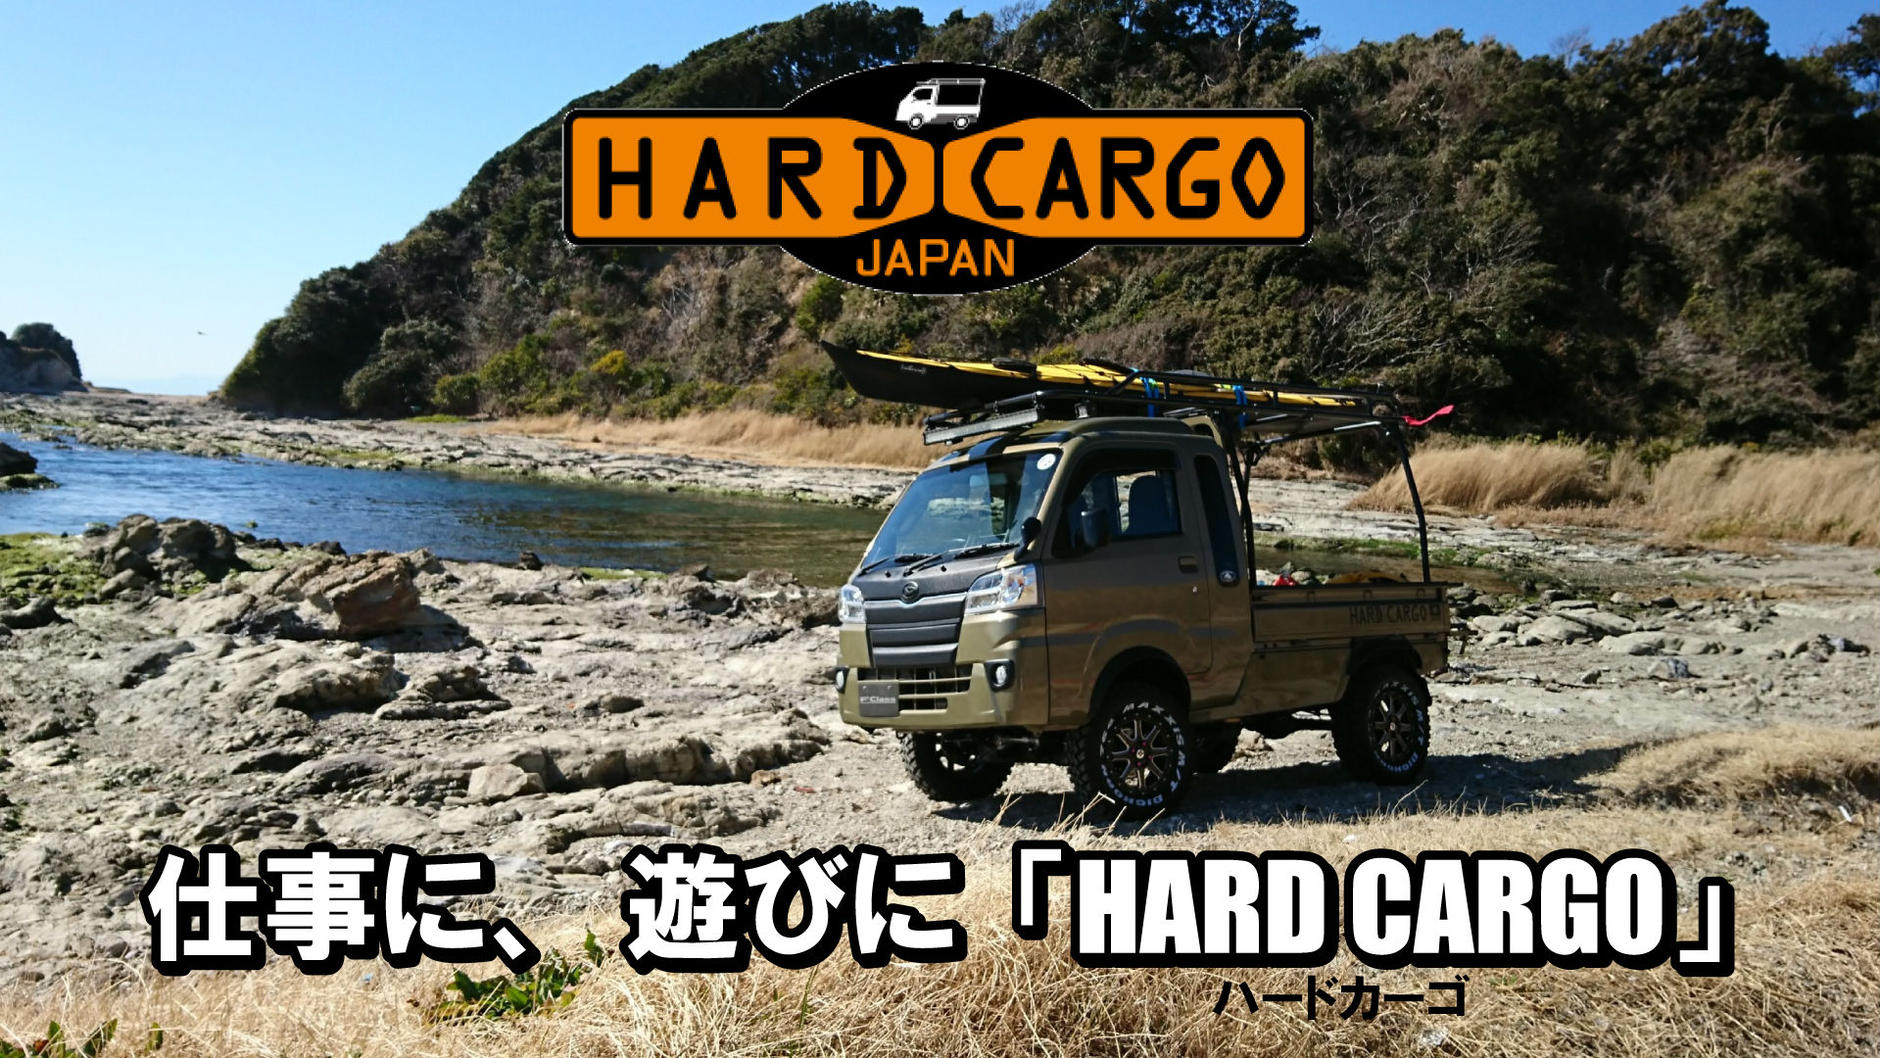 HARD CARGO - Online Store